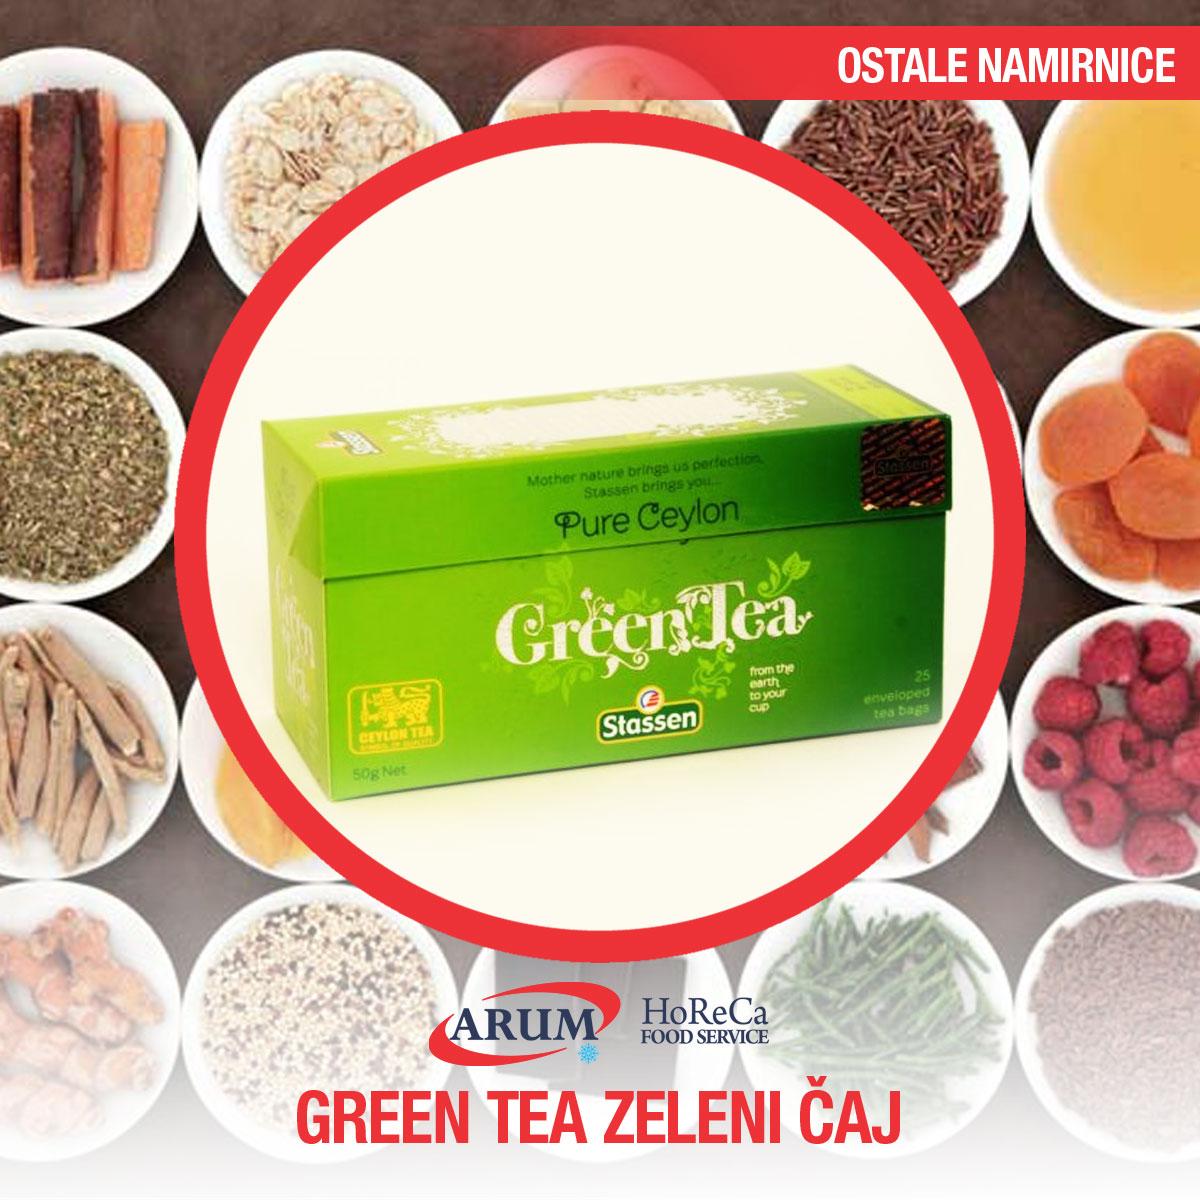 Stassen Green tea - zeleni caj ( kesice 25 kom )